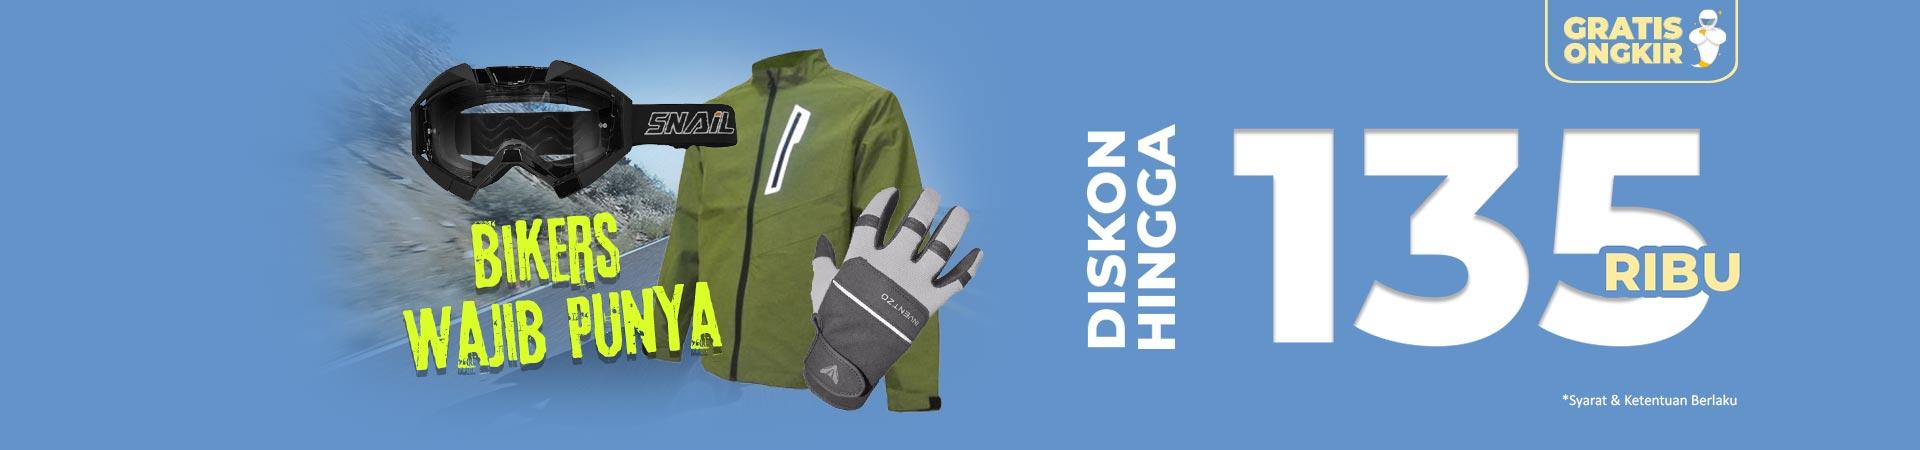 Diskon Jaket Motor, Sarung Tangan, Kaca Mata dan Masker Motor